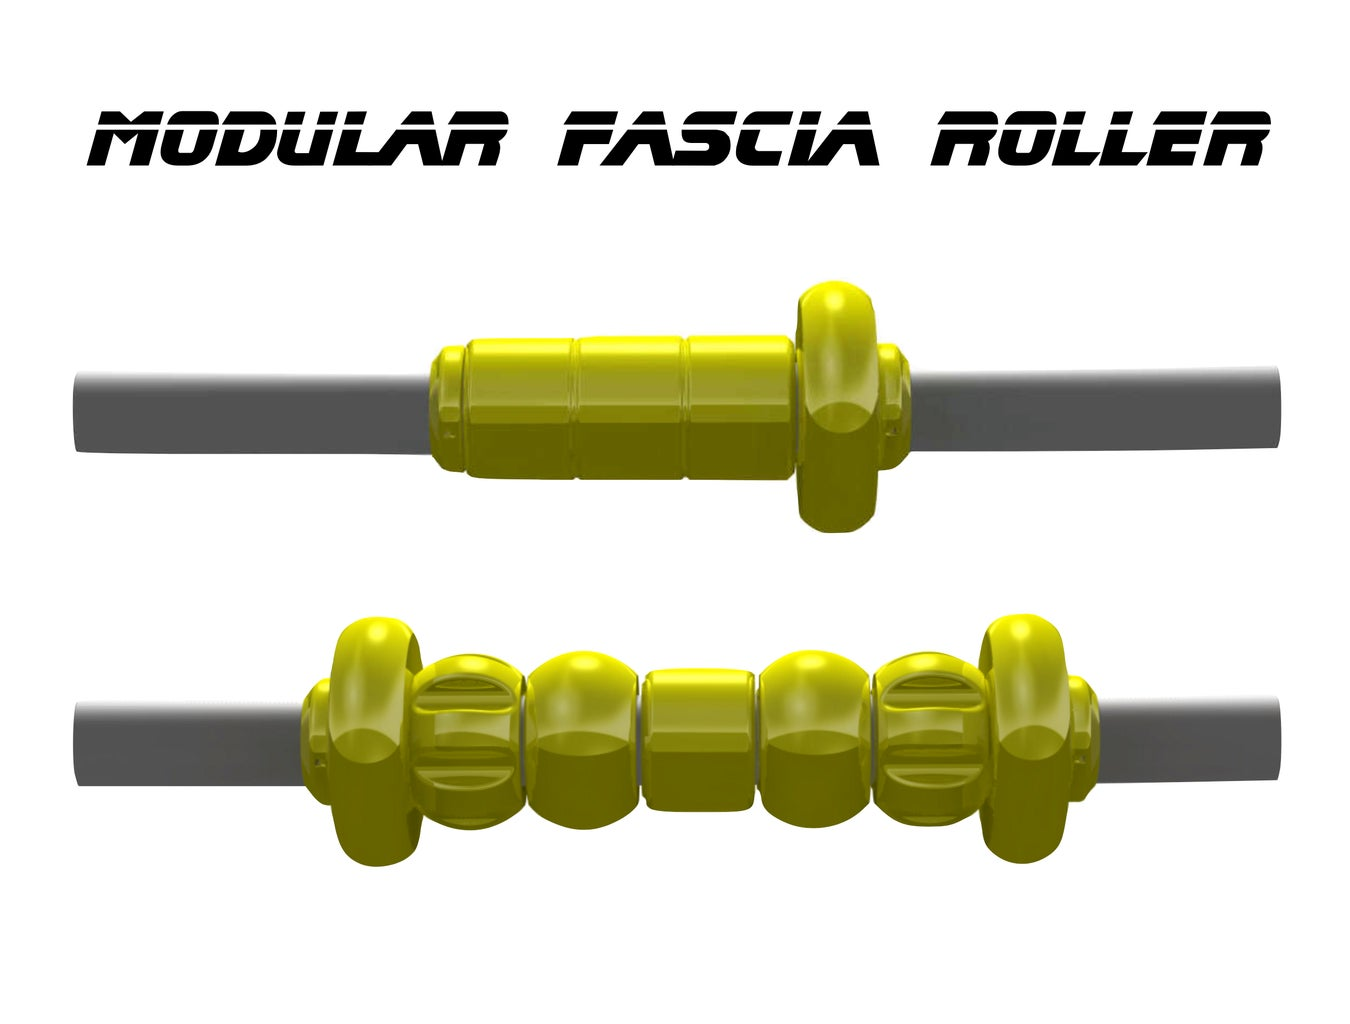 Modular Fascia Roller